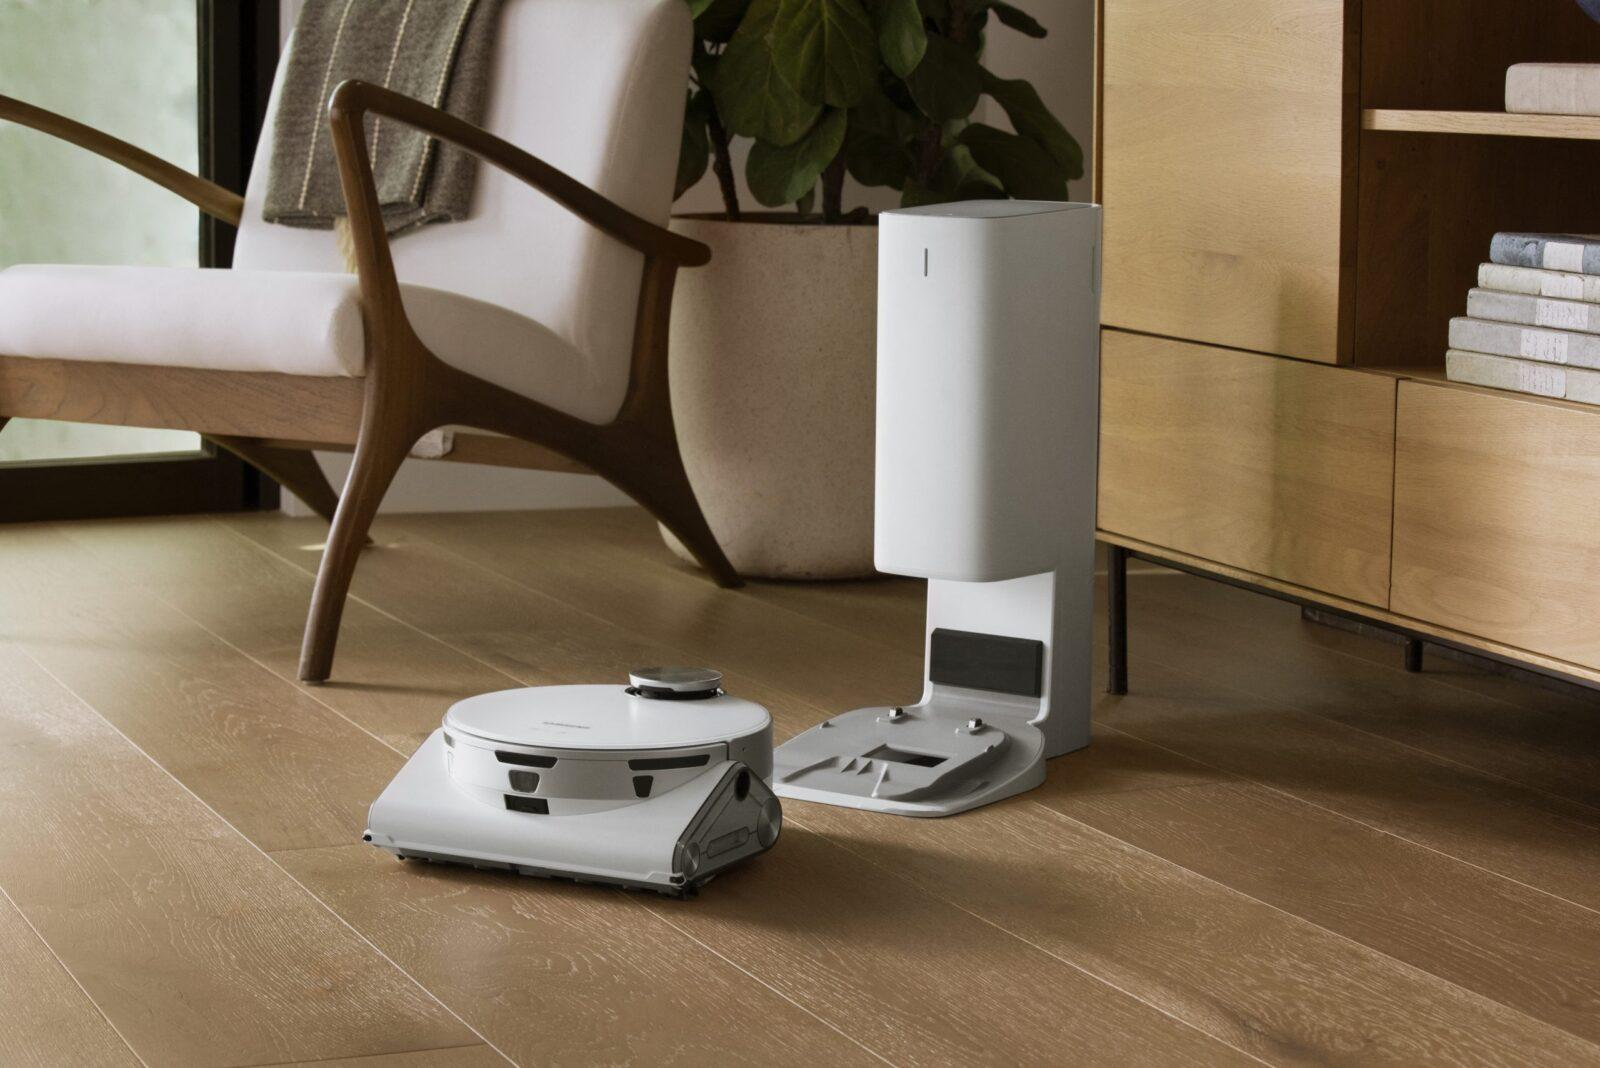 Samsung начала продажи умного робота-пылесоса Jet Bot AI+ (samsung jetbot scaled 1)